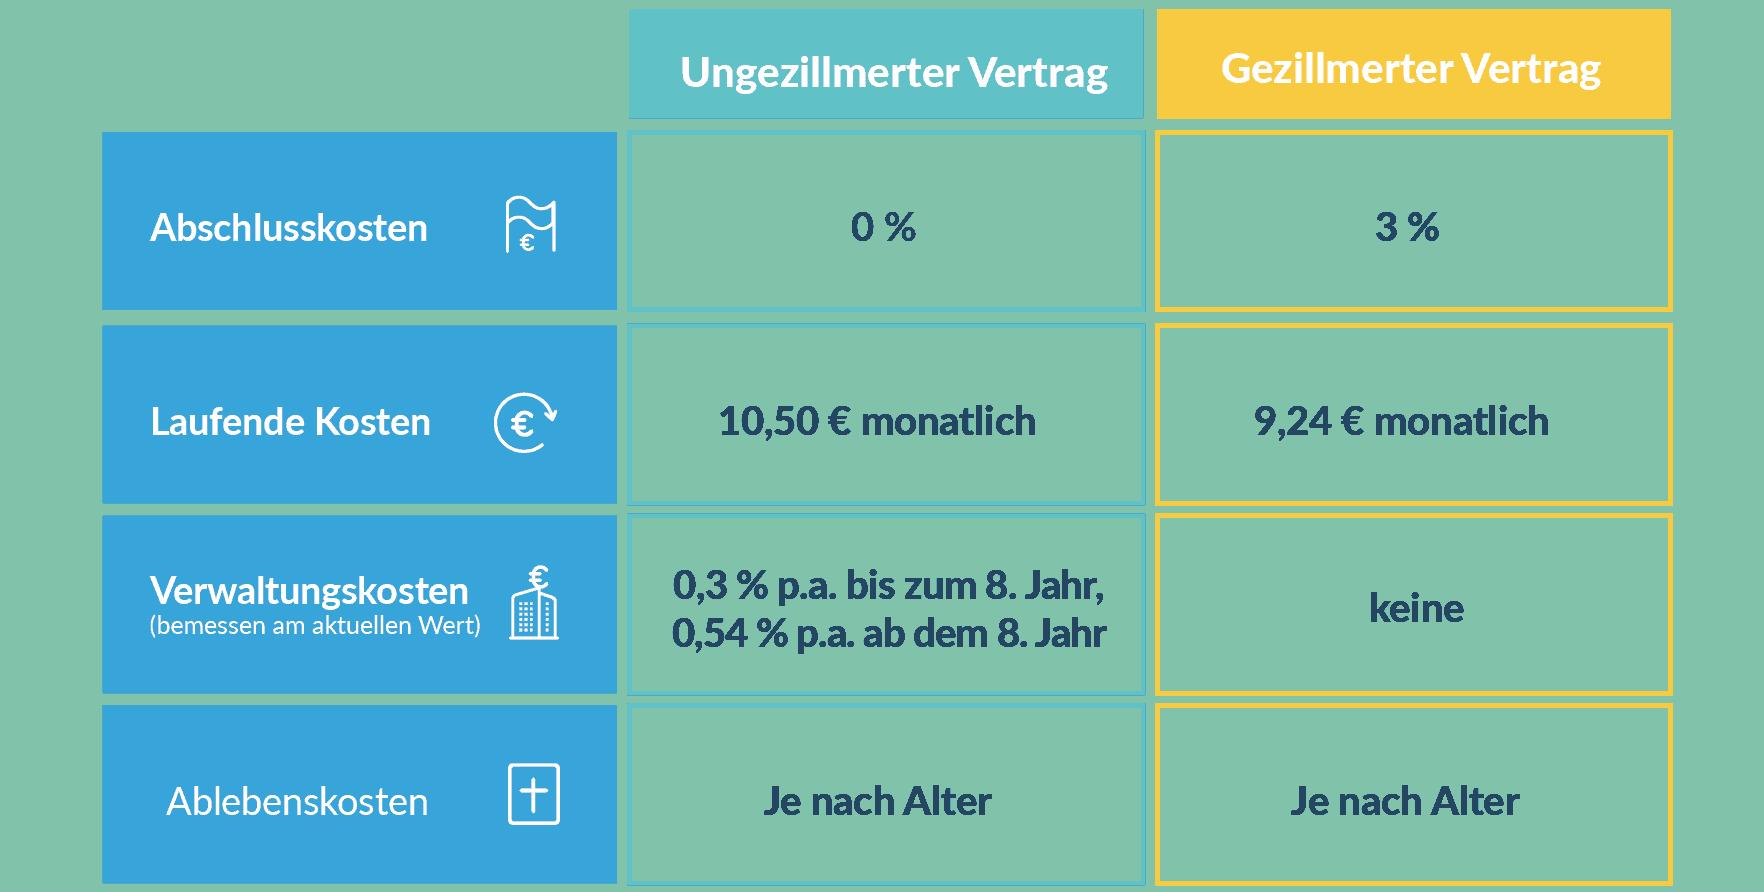 Tabelle: Kostenübersicht gezillmert vs. ungeszillmert